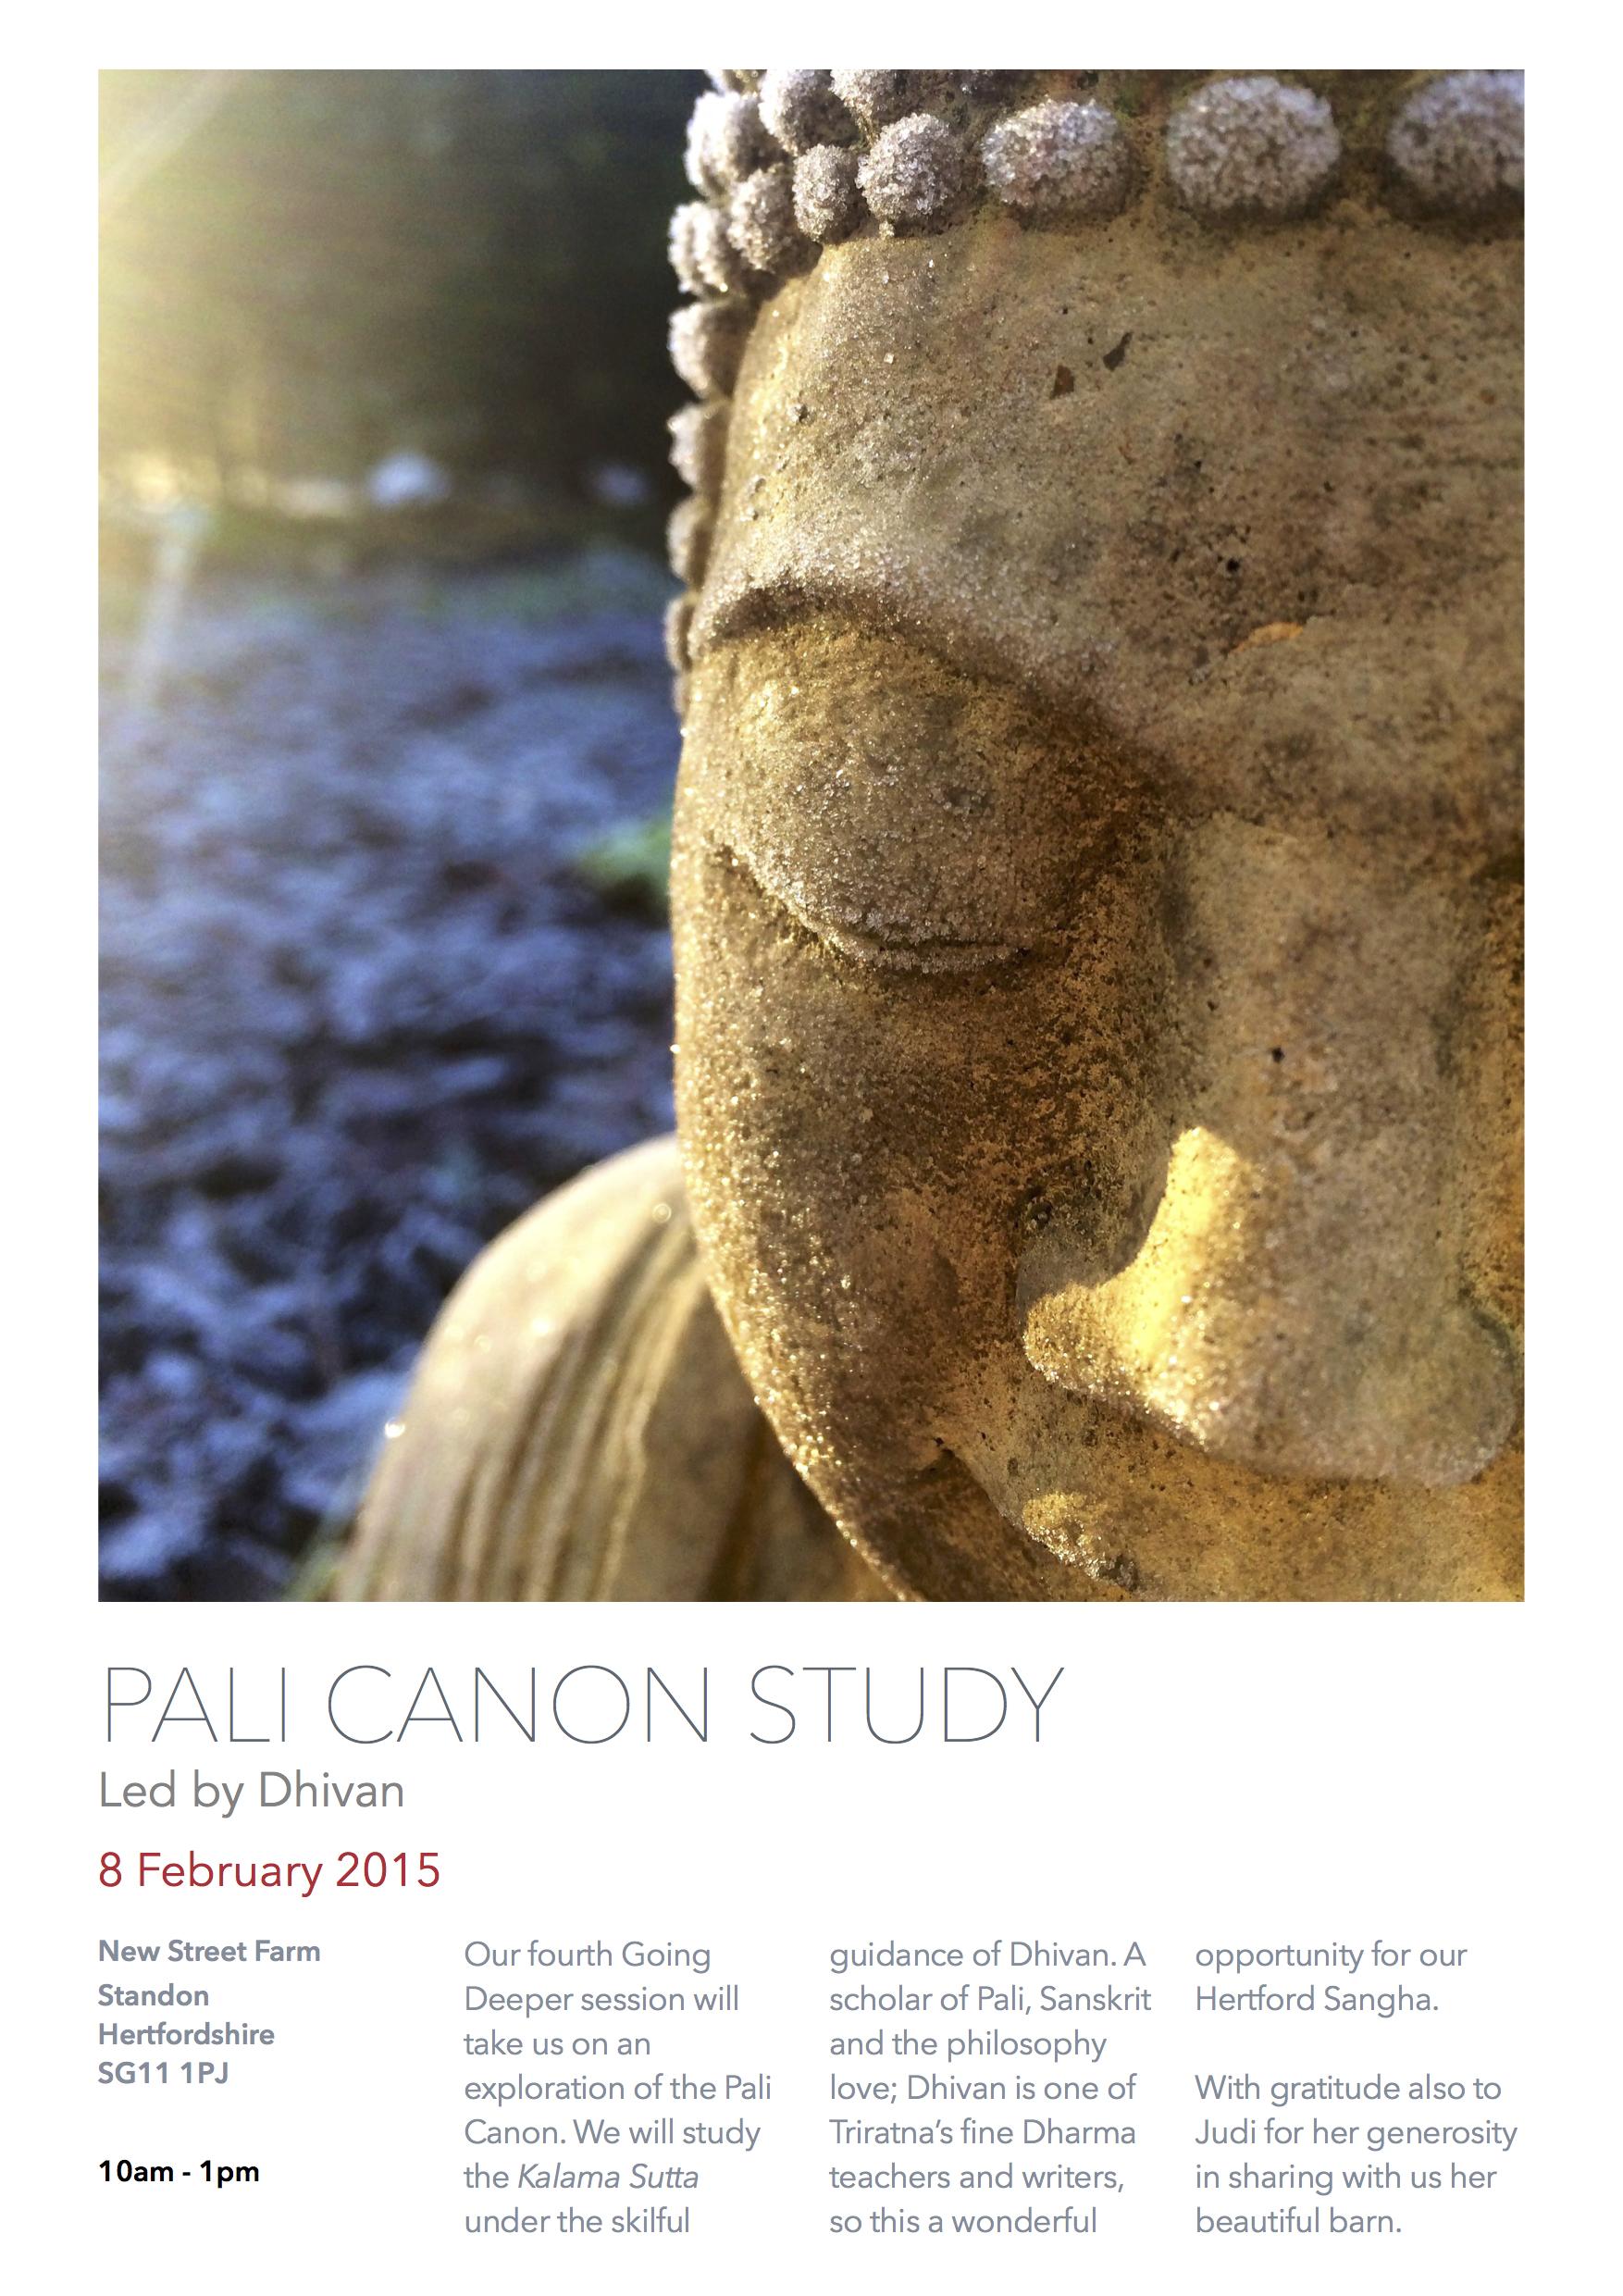 Pali Canon Study - Dhivan